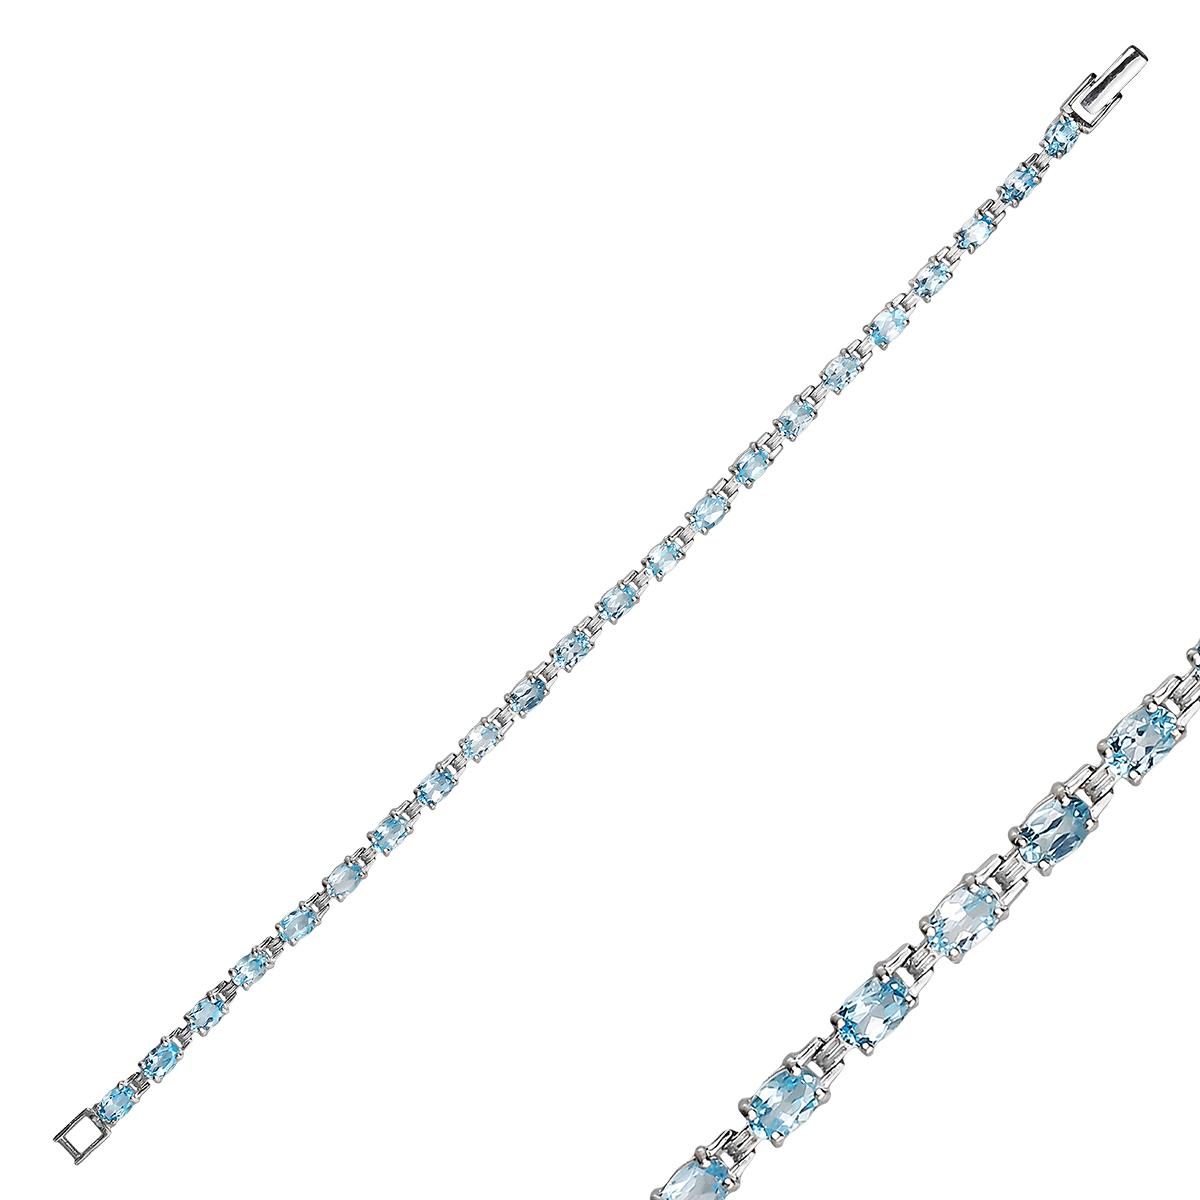 Браслет женский Balex Jewellery 7405937850 из серебра, топаз, р. 21